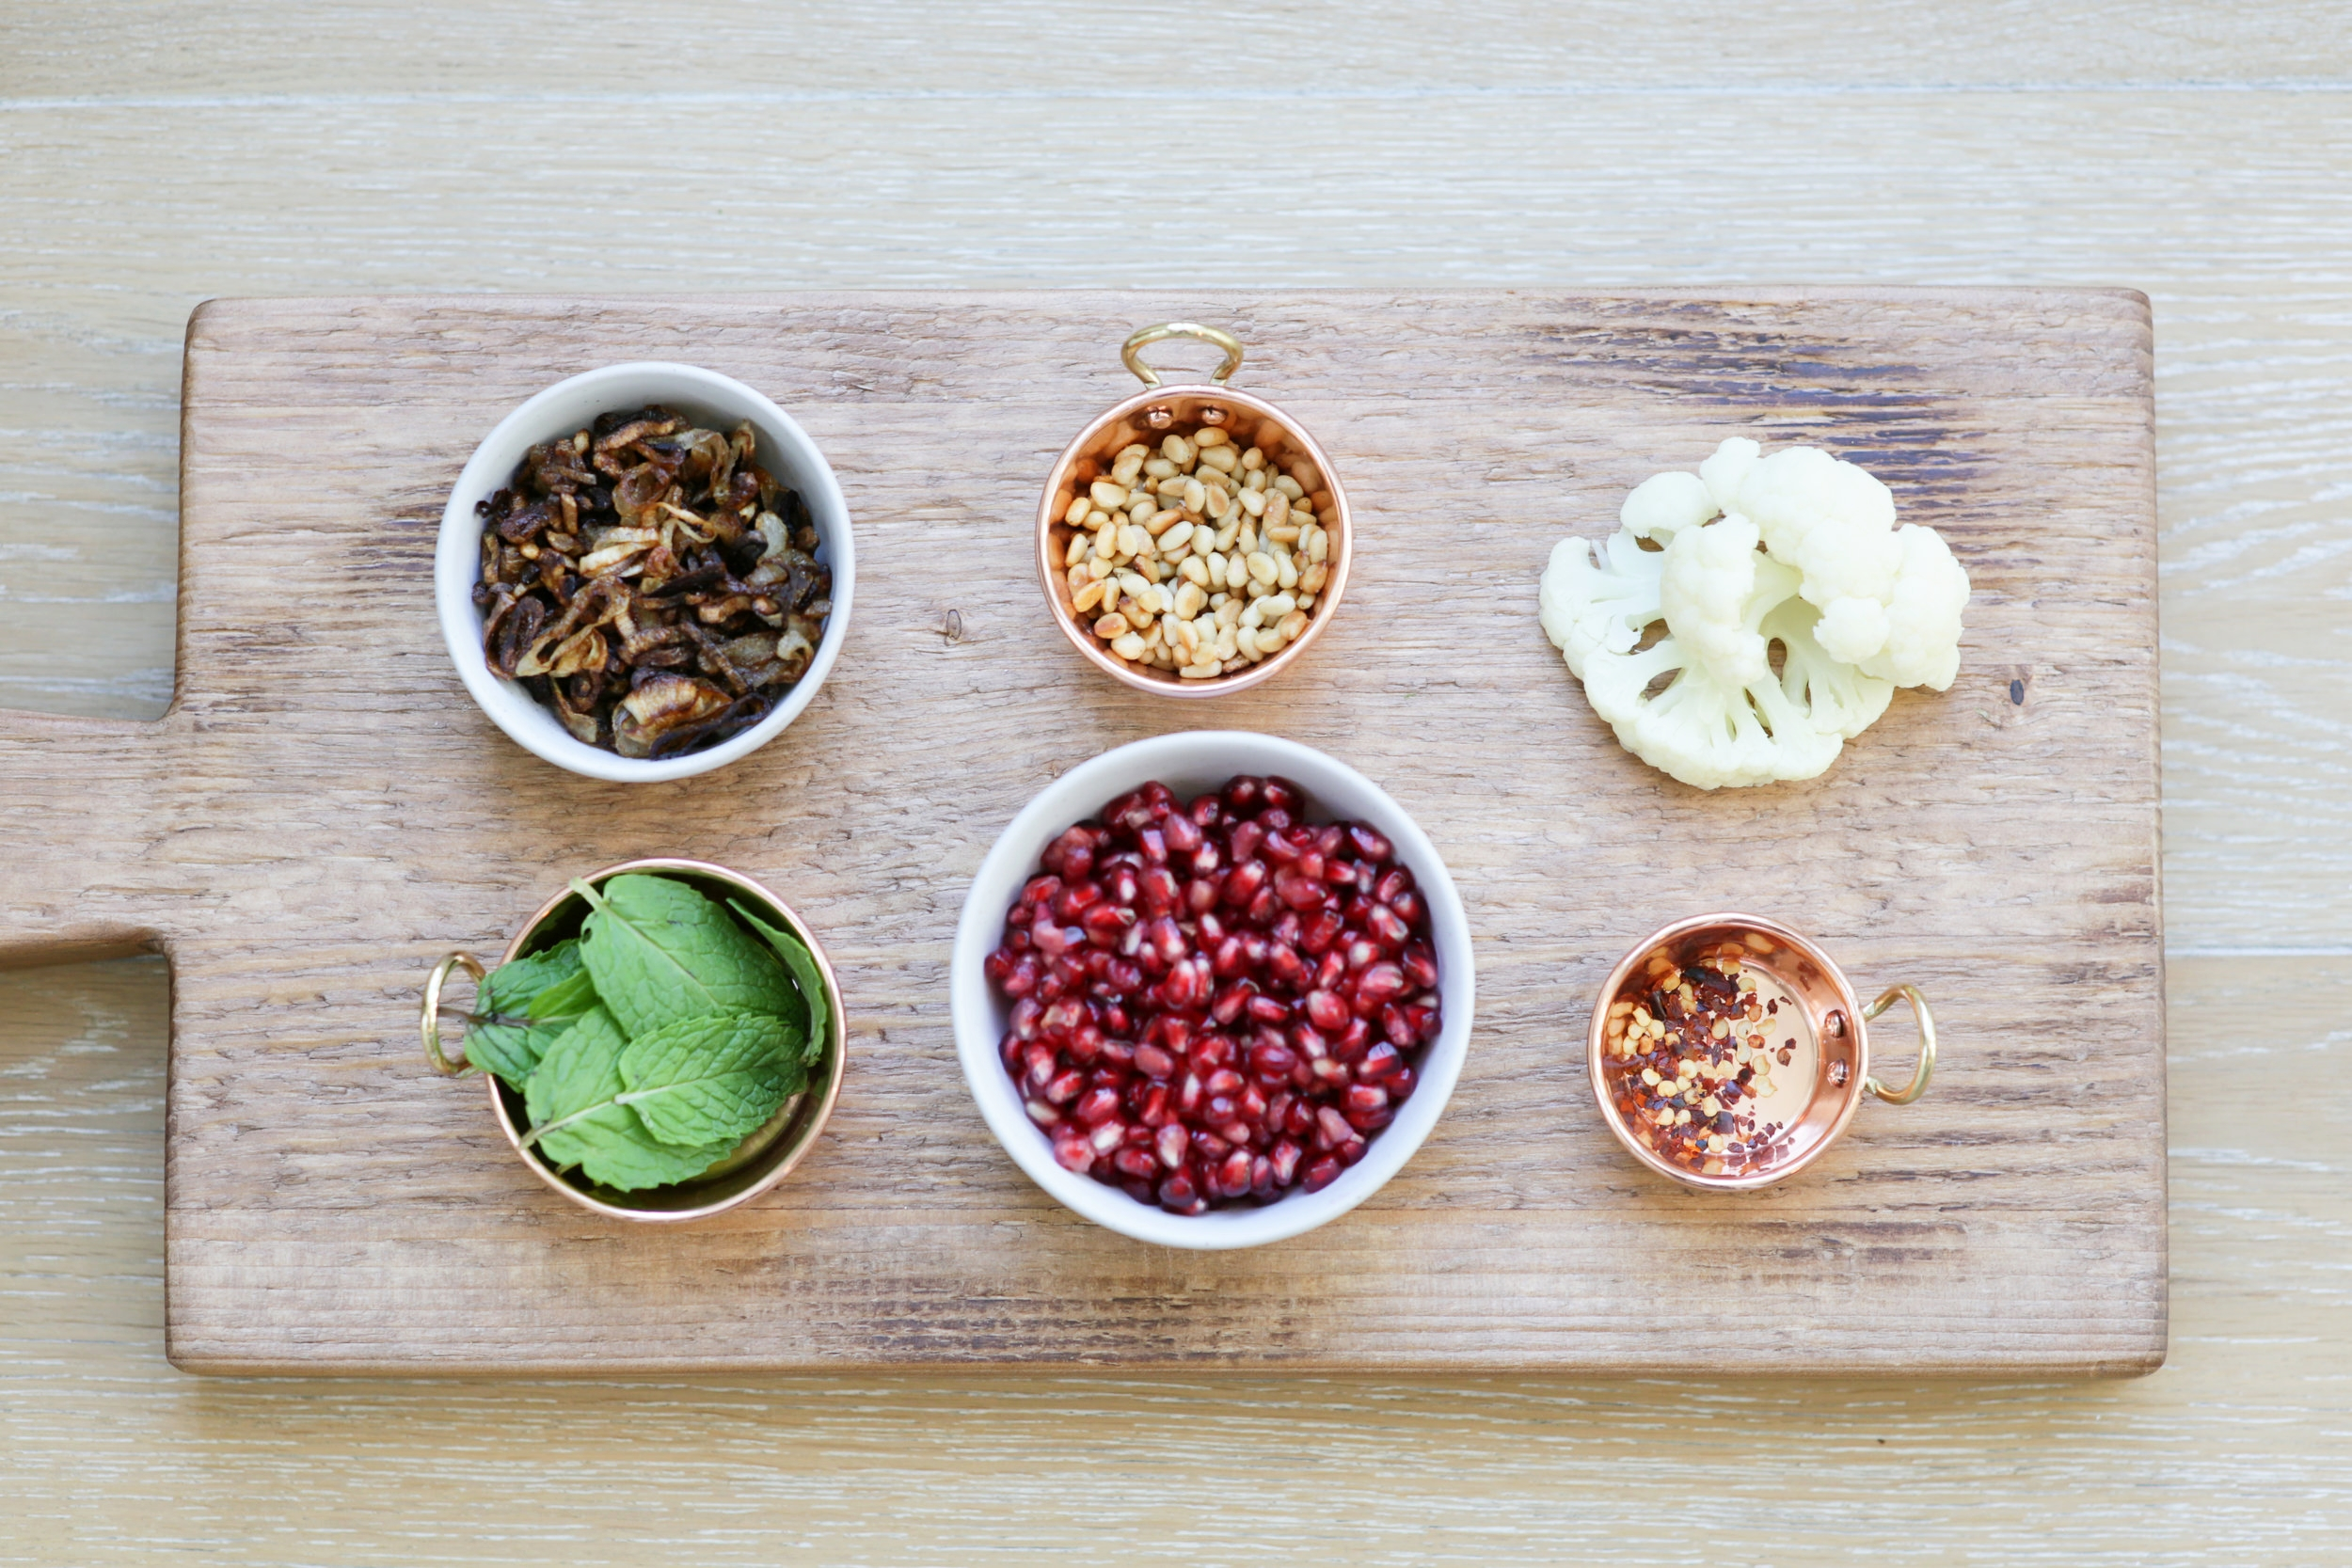 Food Photography of PAMELA SALZMAN'S STOVETOP CAULIFLOWER WITH POMEGRANATE MOLASSES